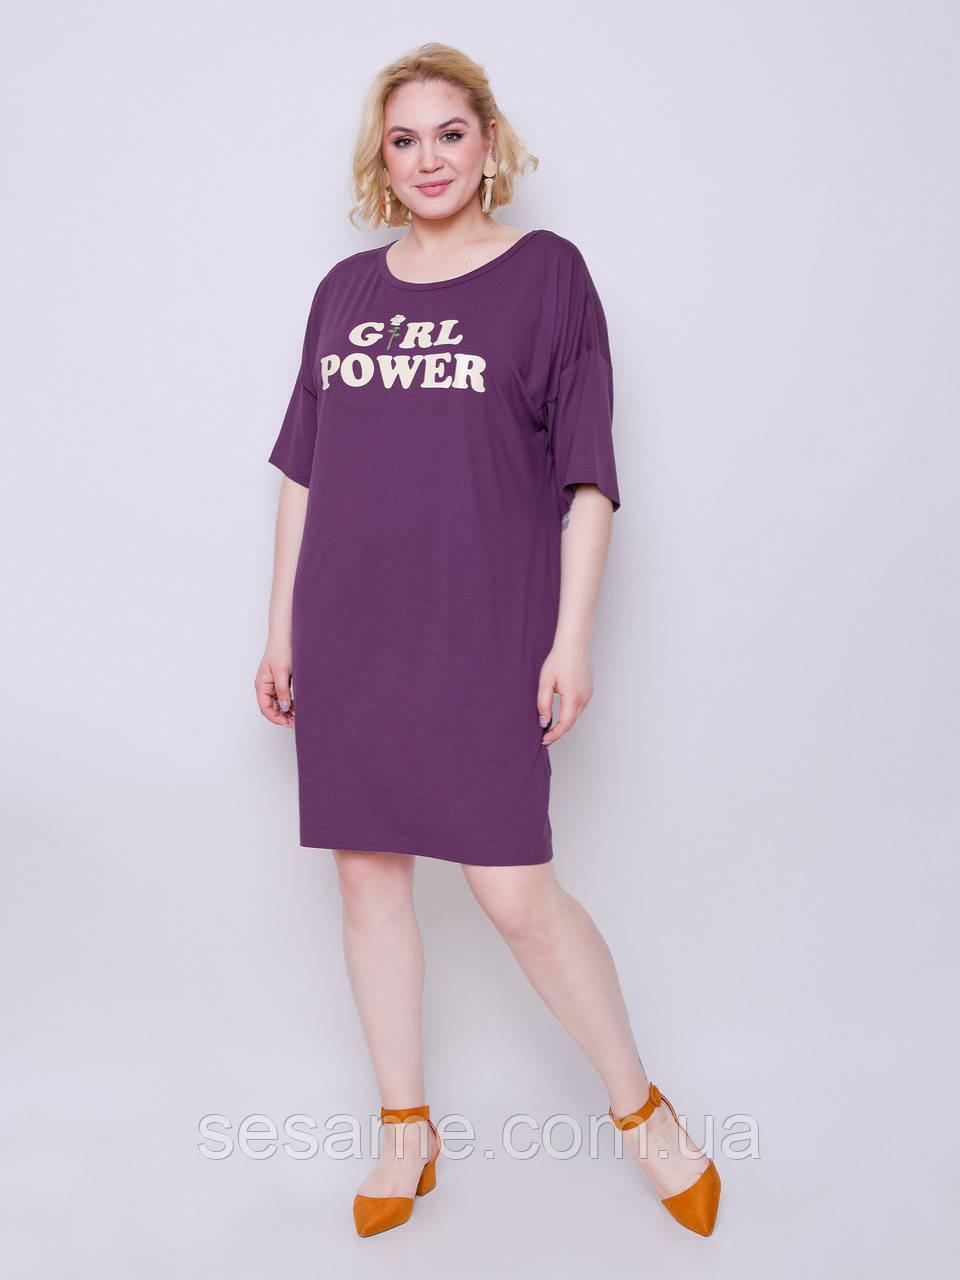 grand ua Паллада 2019 платье - футболка